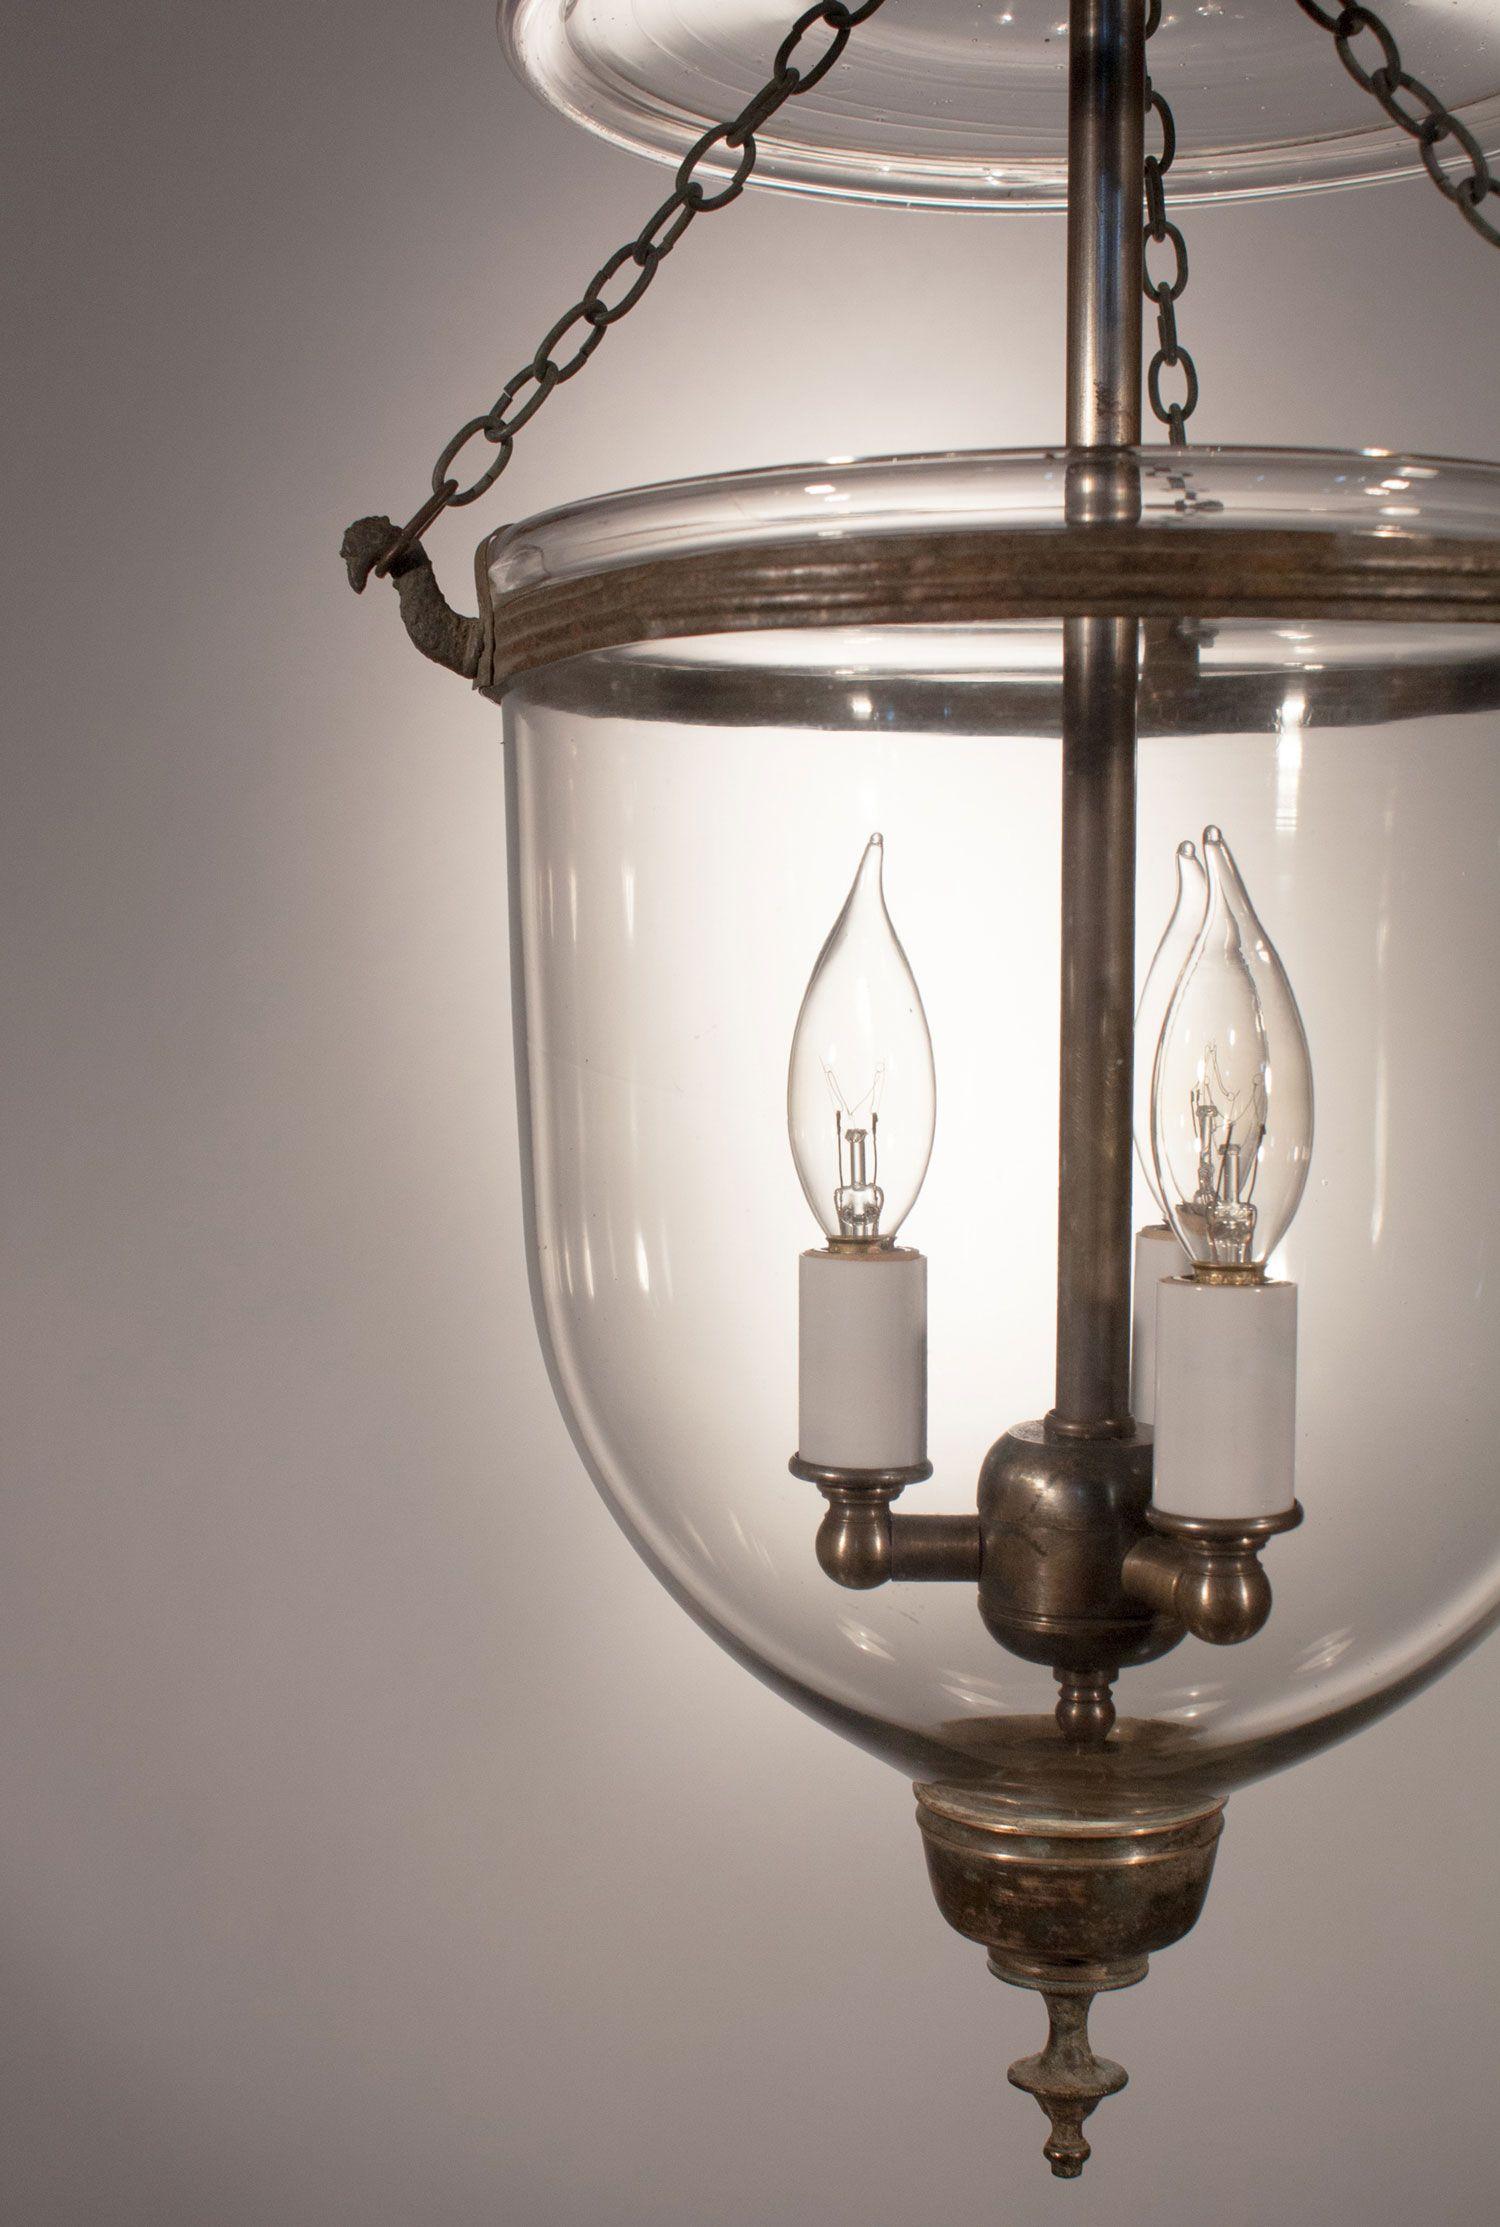 Petite Antique Bell Jar Lantern Pendant Light Fixture